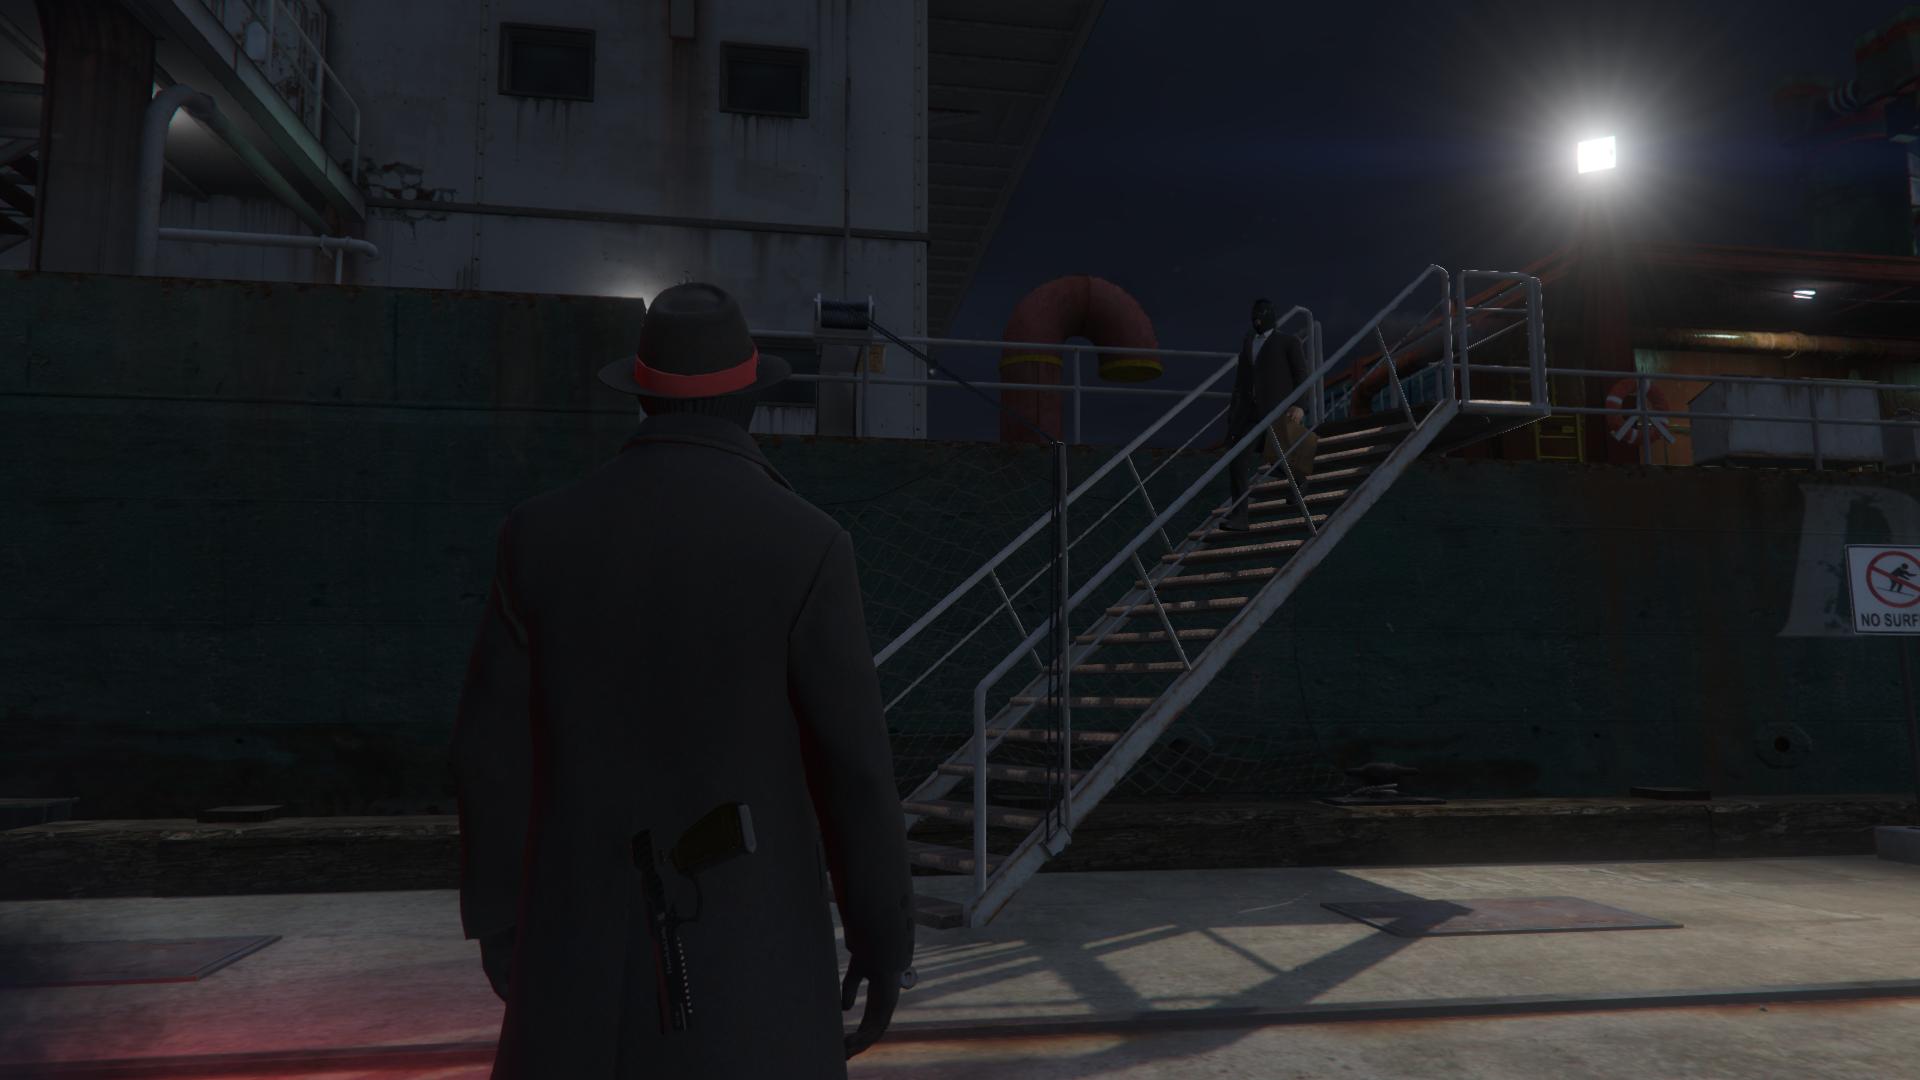 Grand-Theft-Auto-V-Screenshot-2021-01-04-12-04-46-98.png